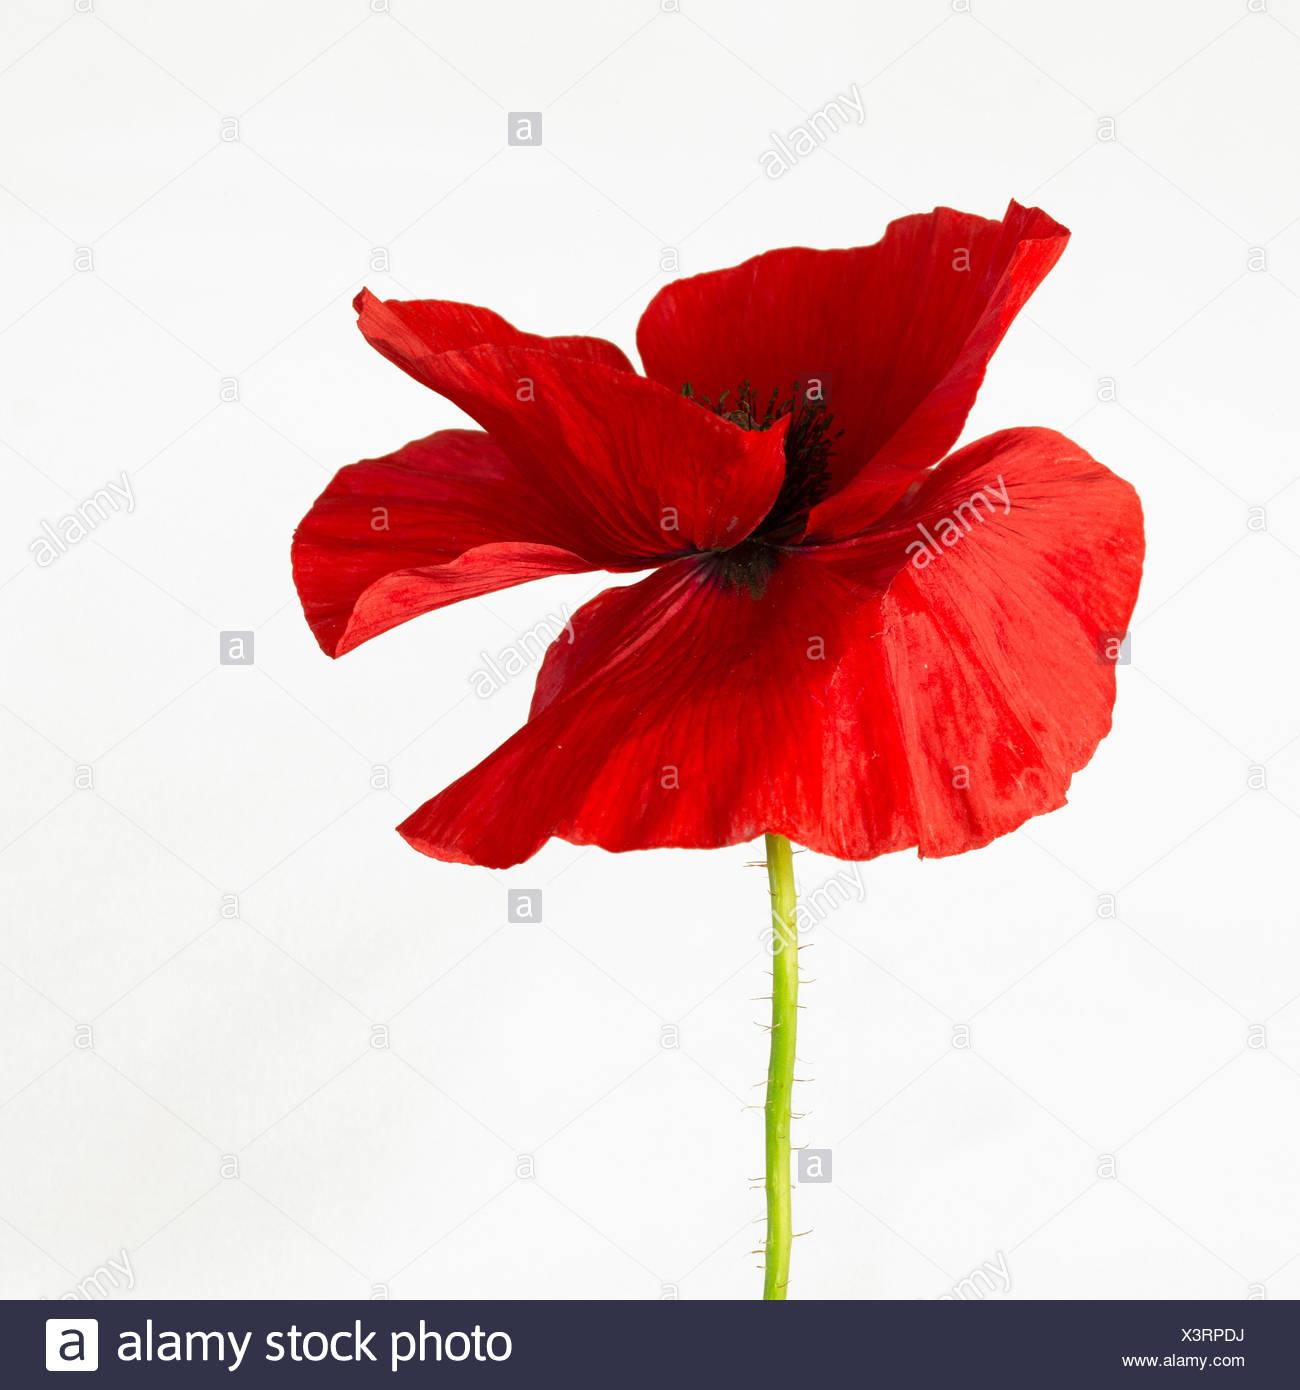 Poppy papaver papaver rhoeas annual beauty in nature belguim poppy papaver papaver rhoeas annual beauty in nature belguim national flower izmirmasajfo